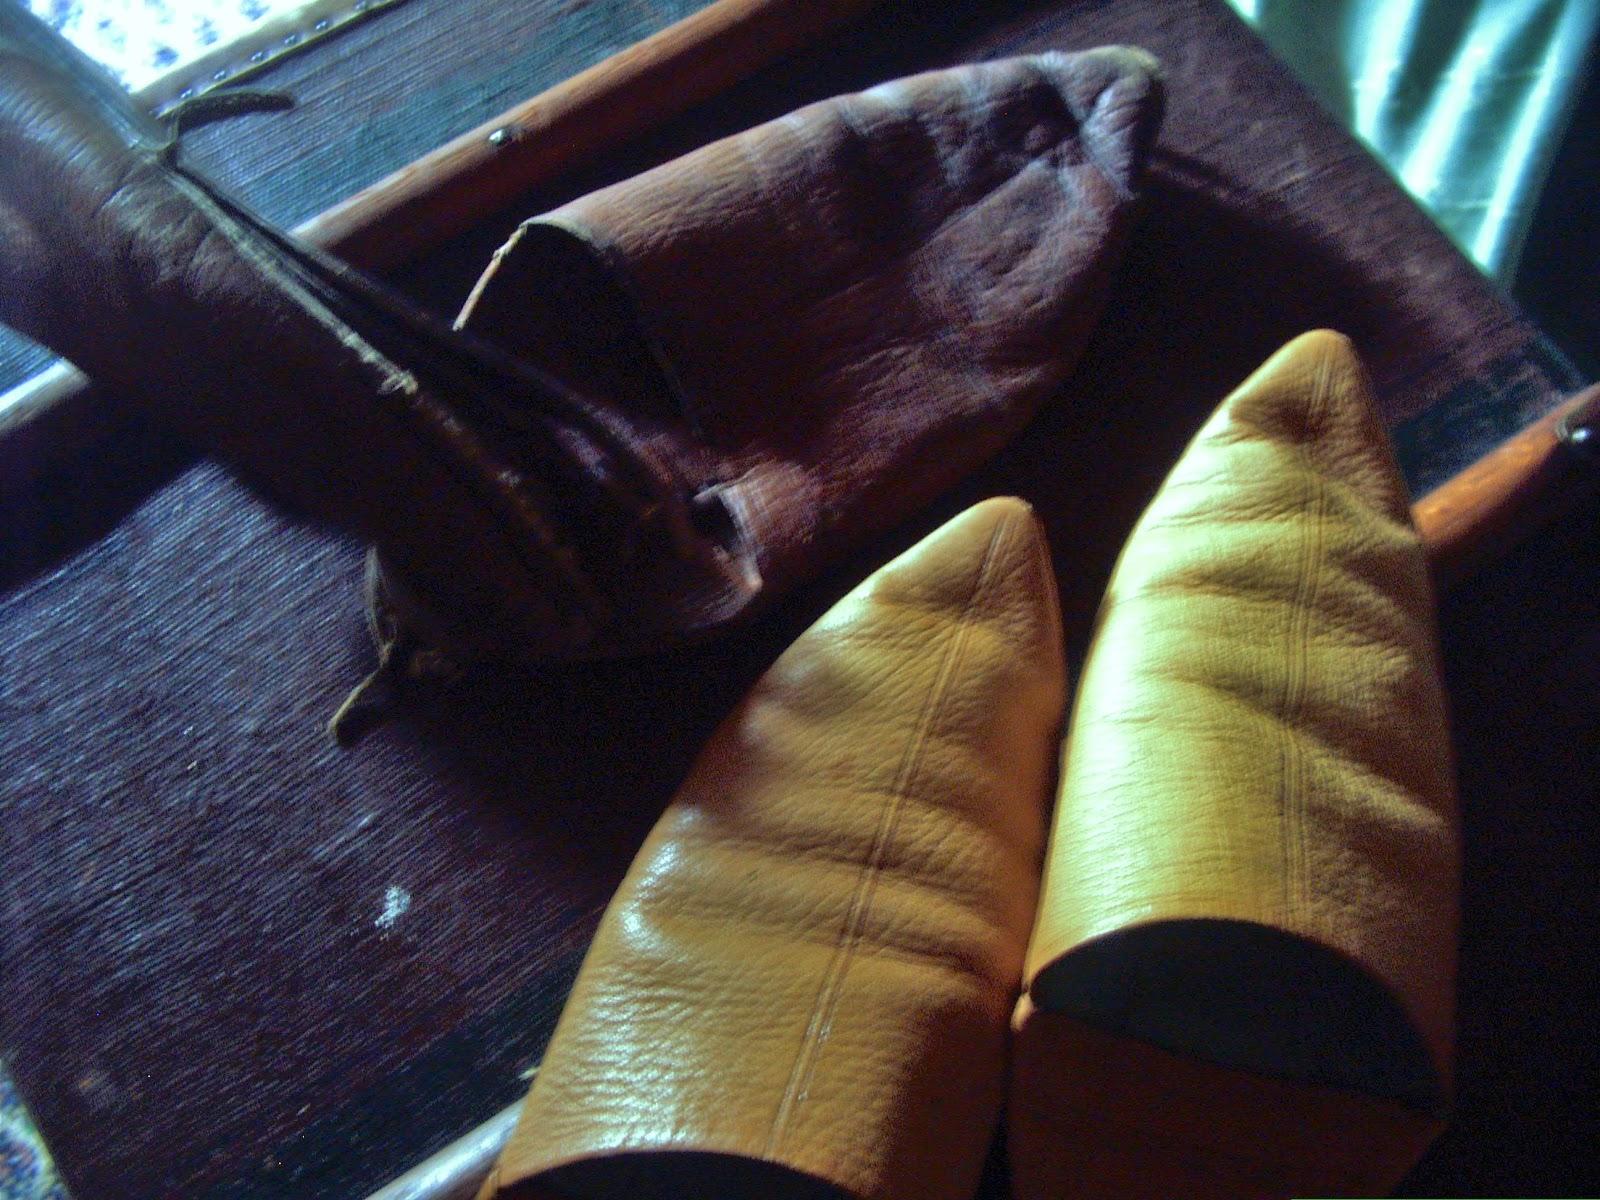 Ghasal's Kreativblog: 17.10.2012